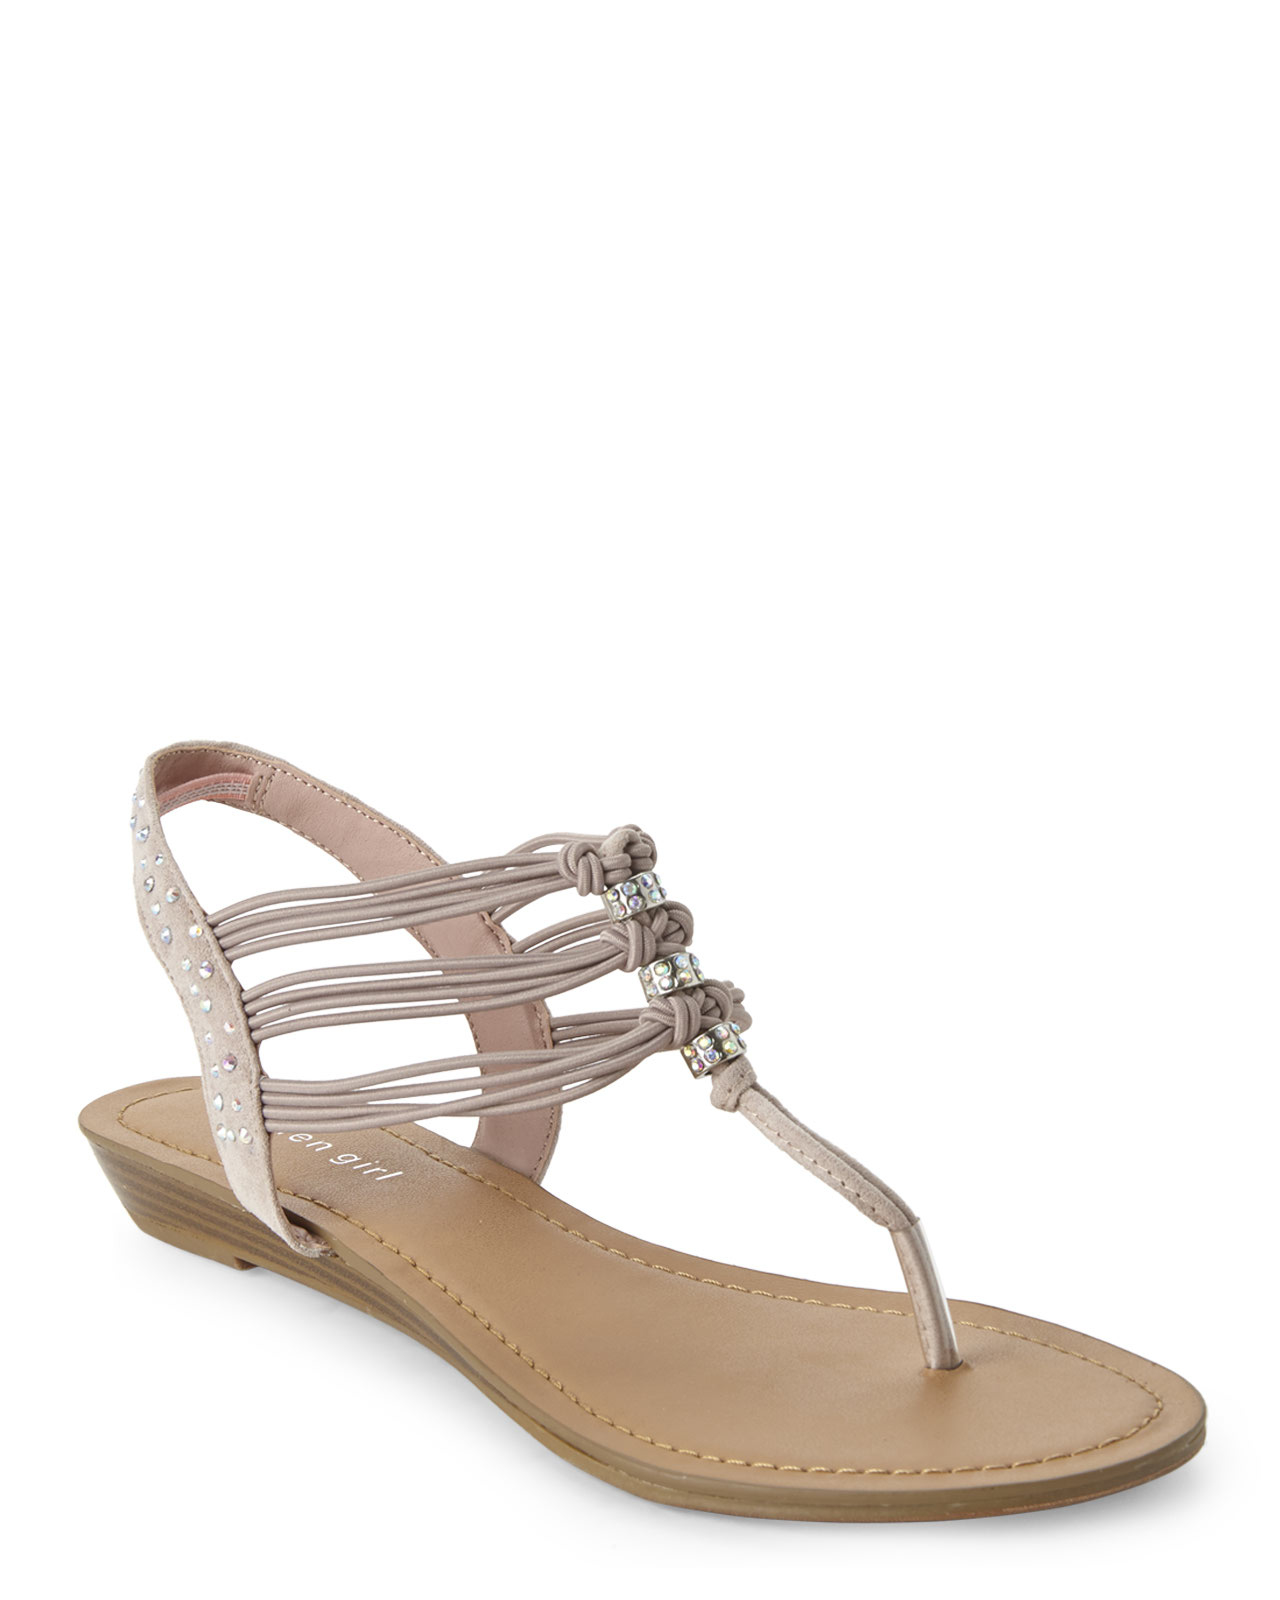 Madden Girl Blush Thrill Strappy Sandals In Pink Lyst